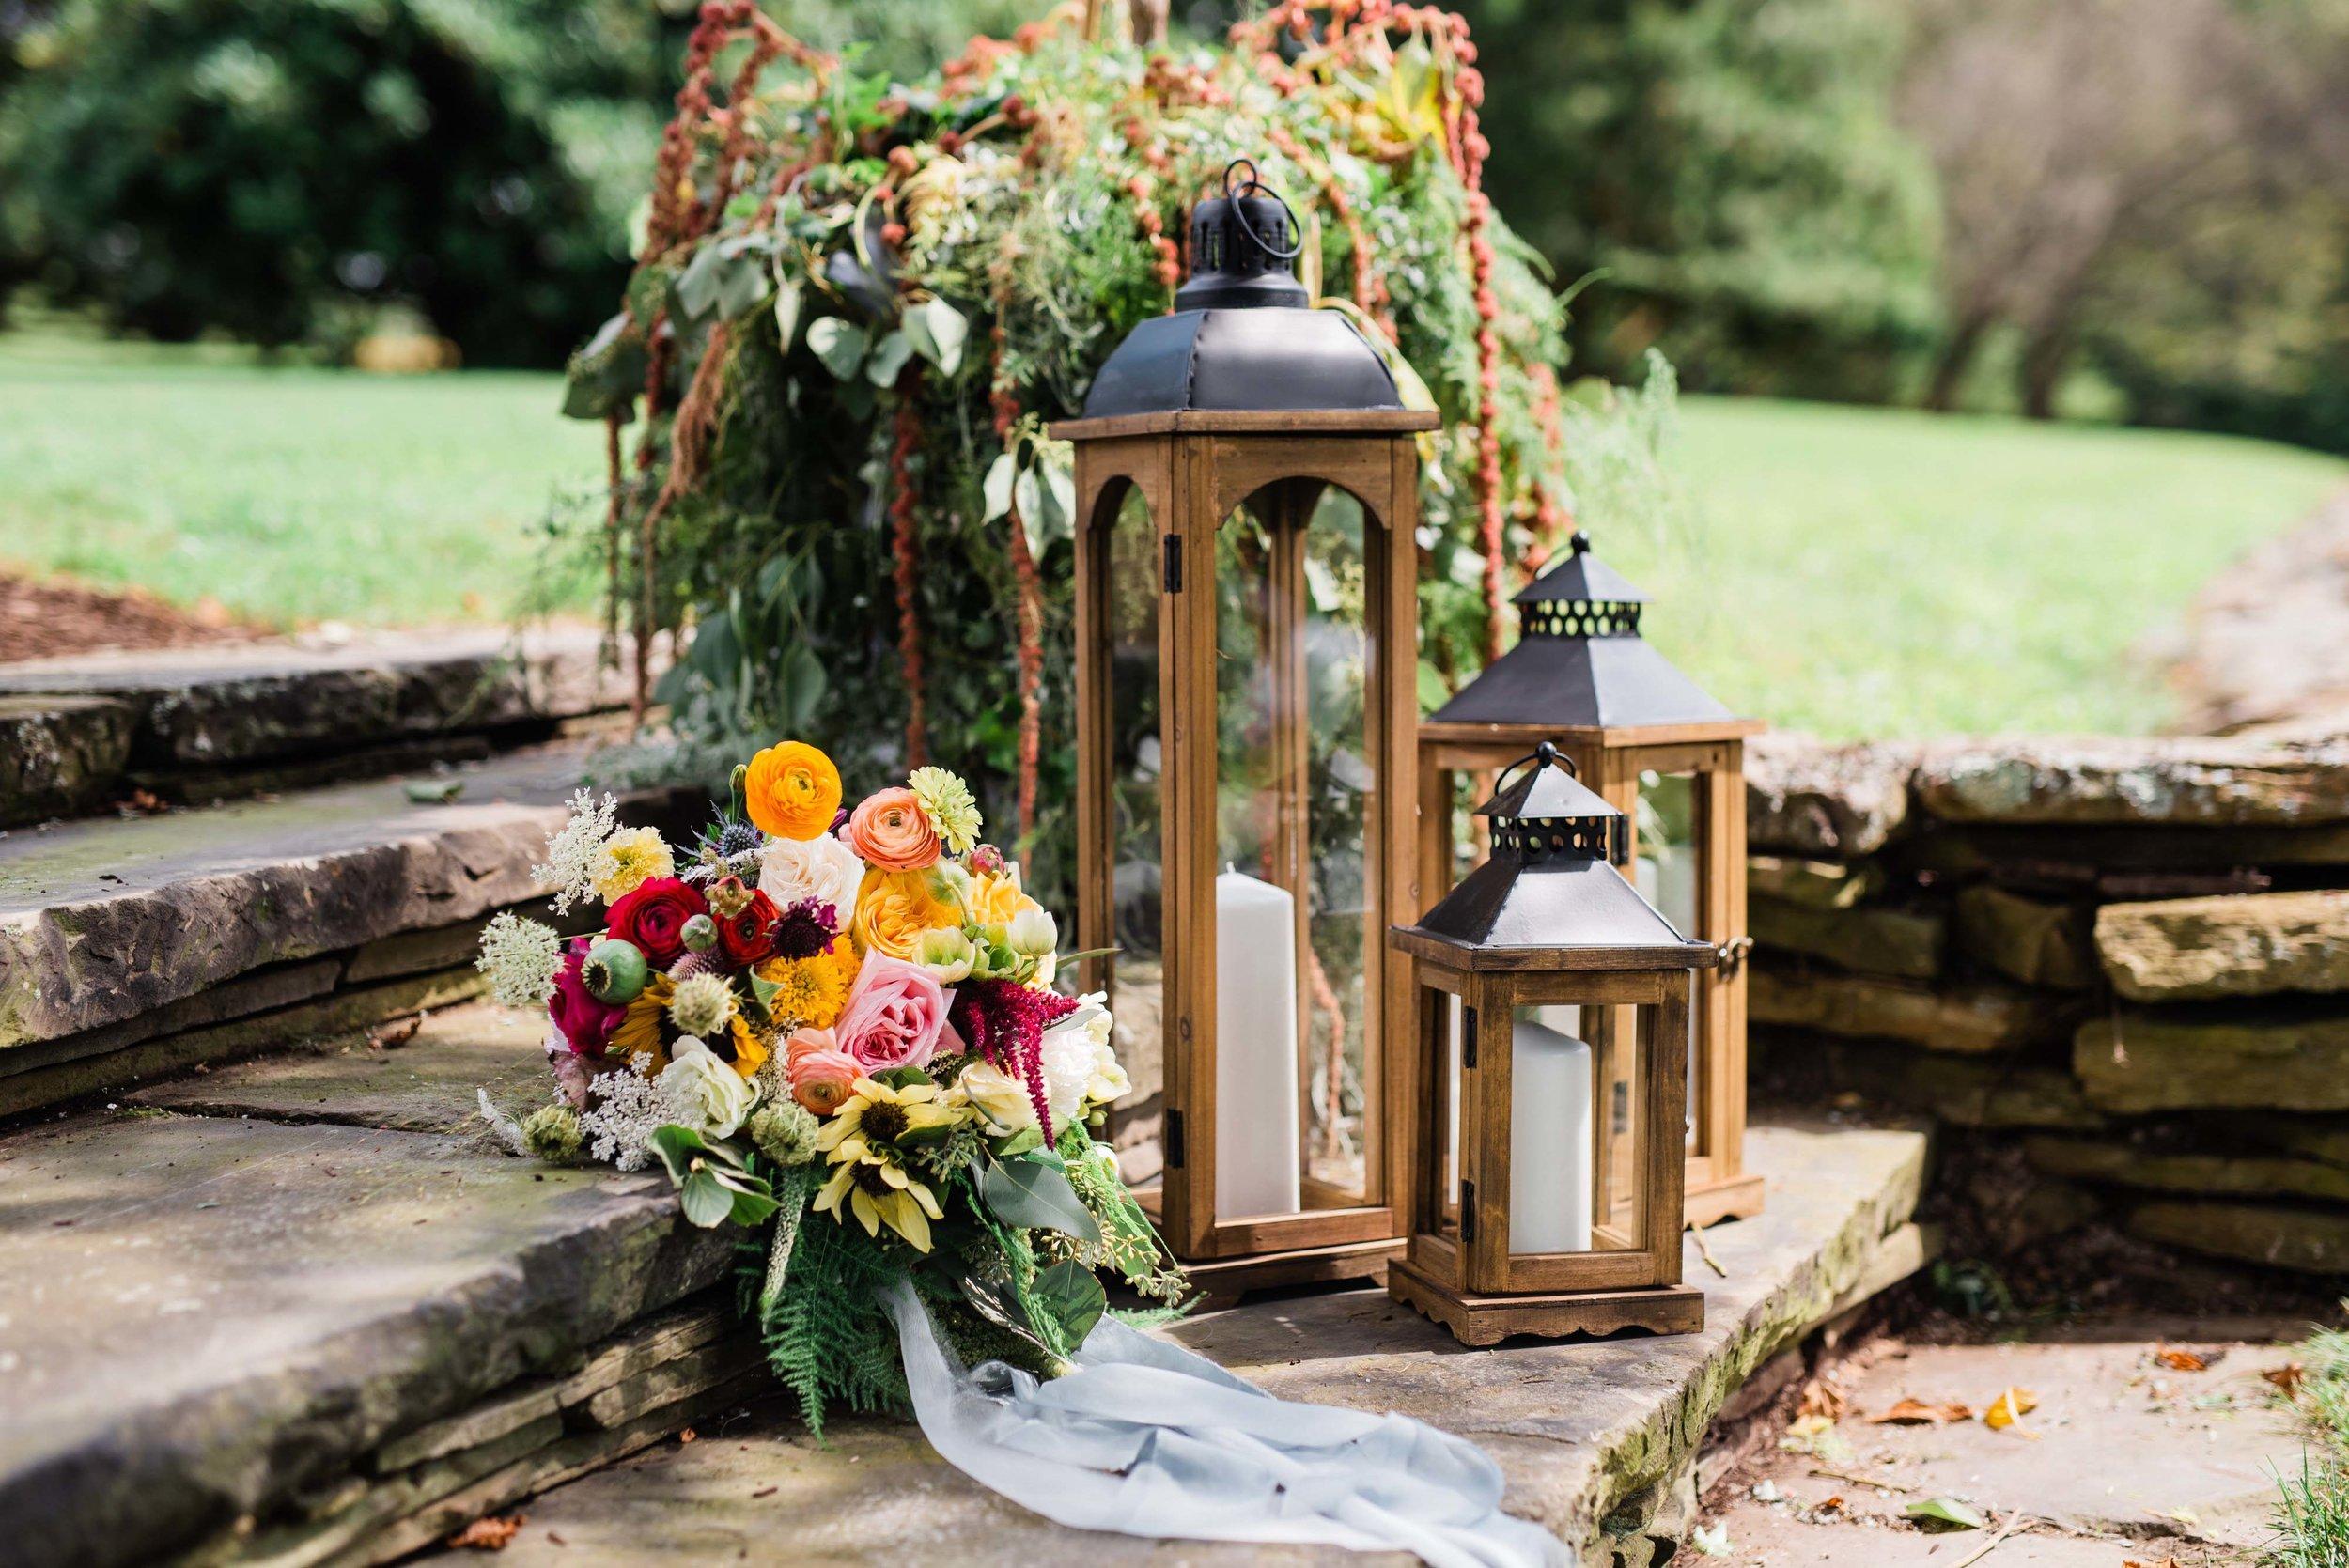 pittsburgh wedding photographer barn weddingpittsburgh wedding photographer barn wedding